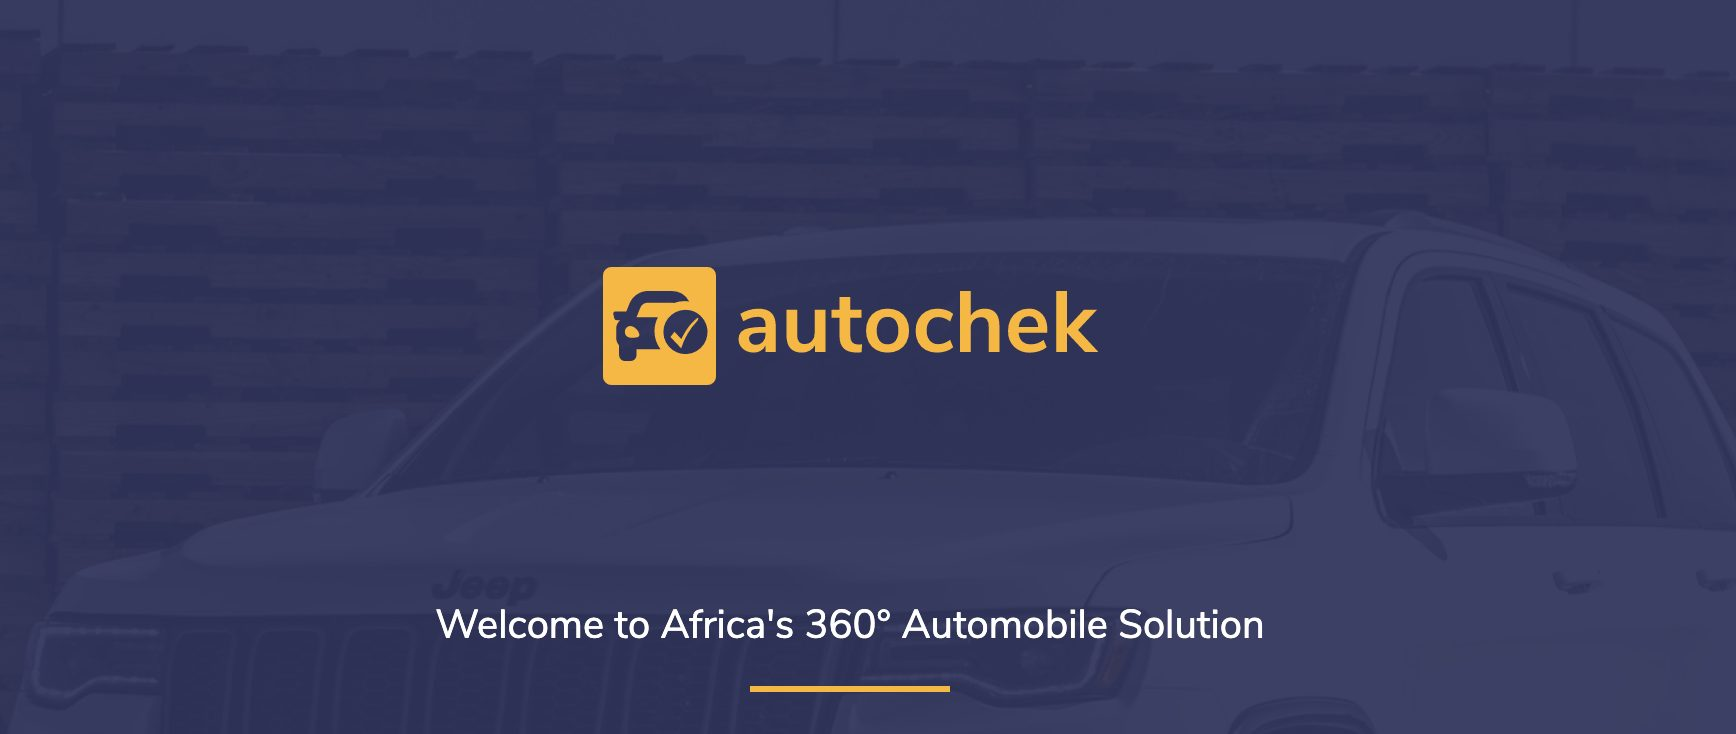 Autochek Acquires Africa's Online Car Platforms Cheki Nigeria and Cheki  Ghana - Tech Nova